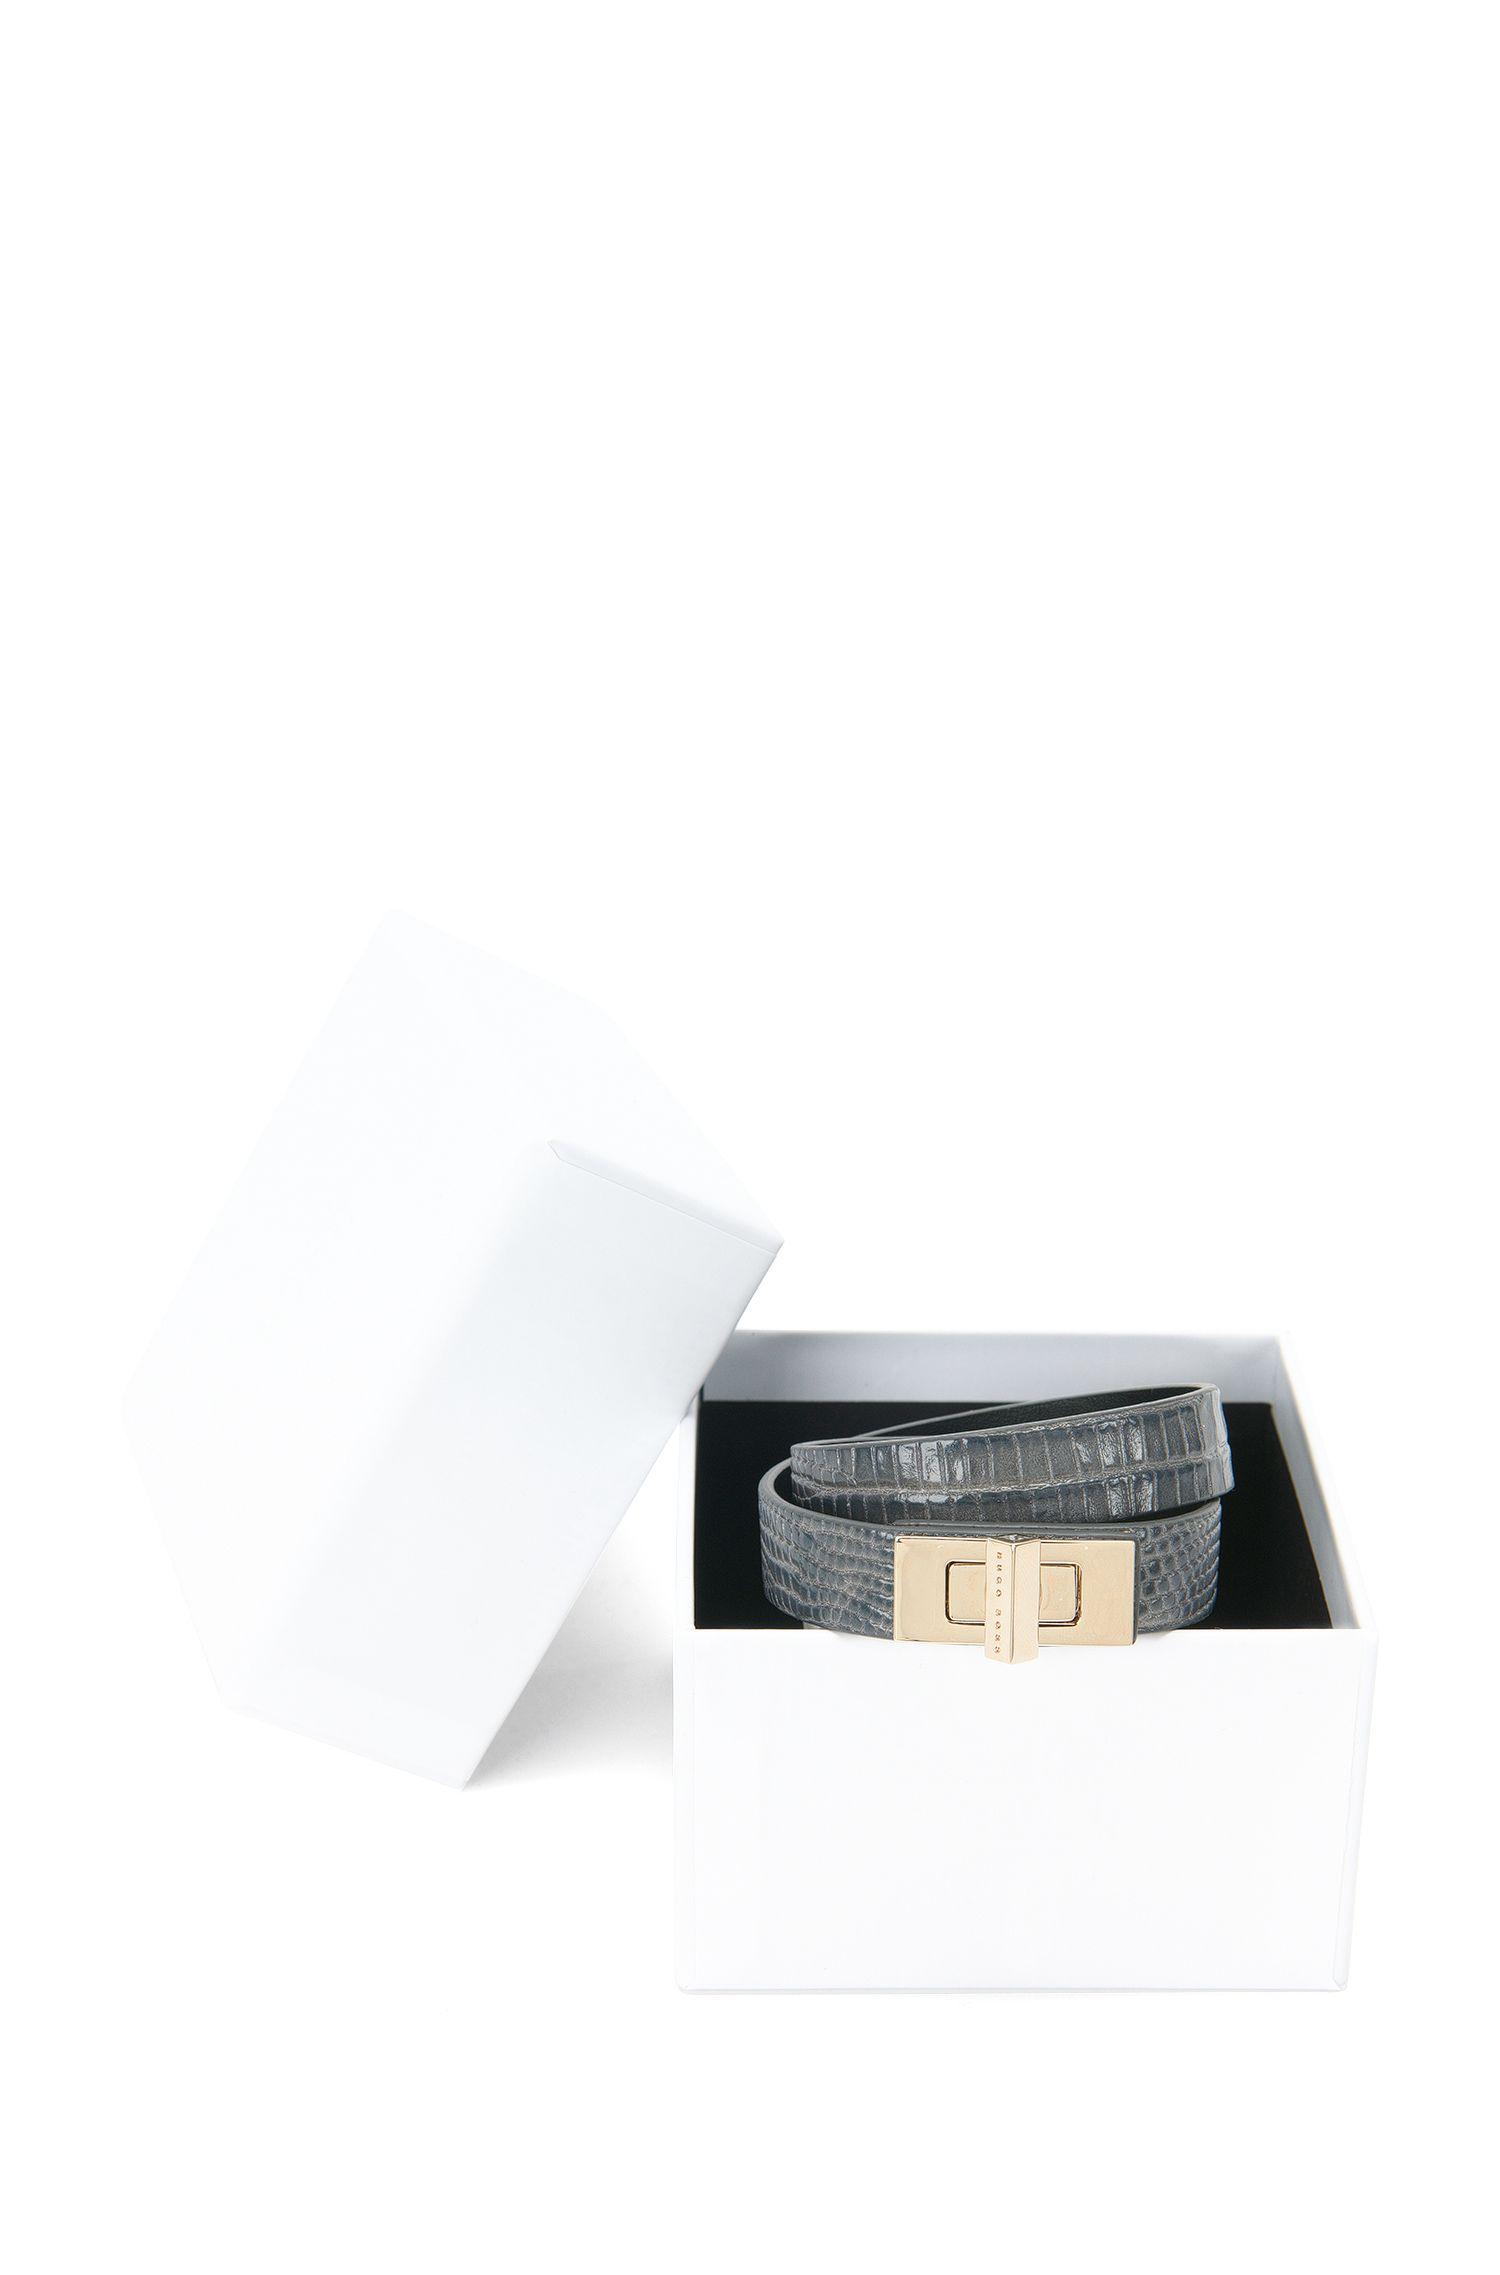 BOSS Bespoke-armband van leer met reptielprint